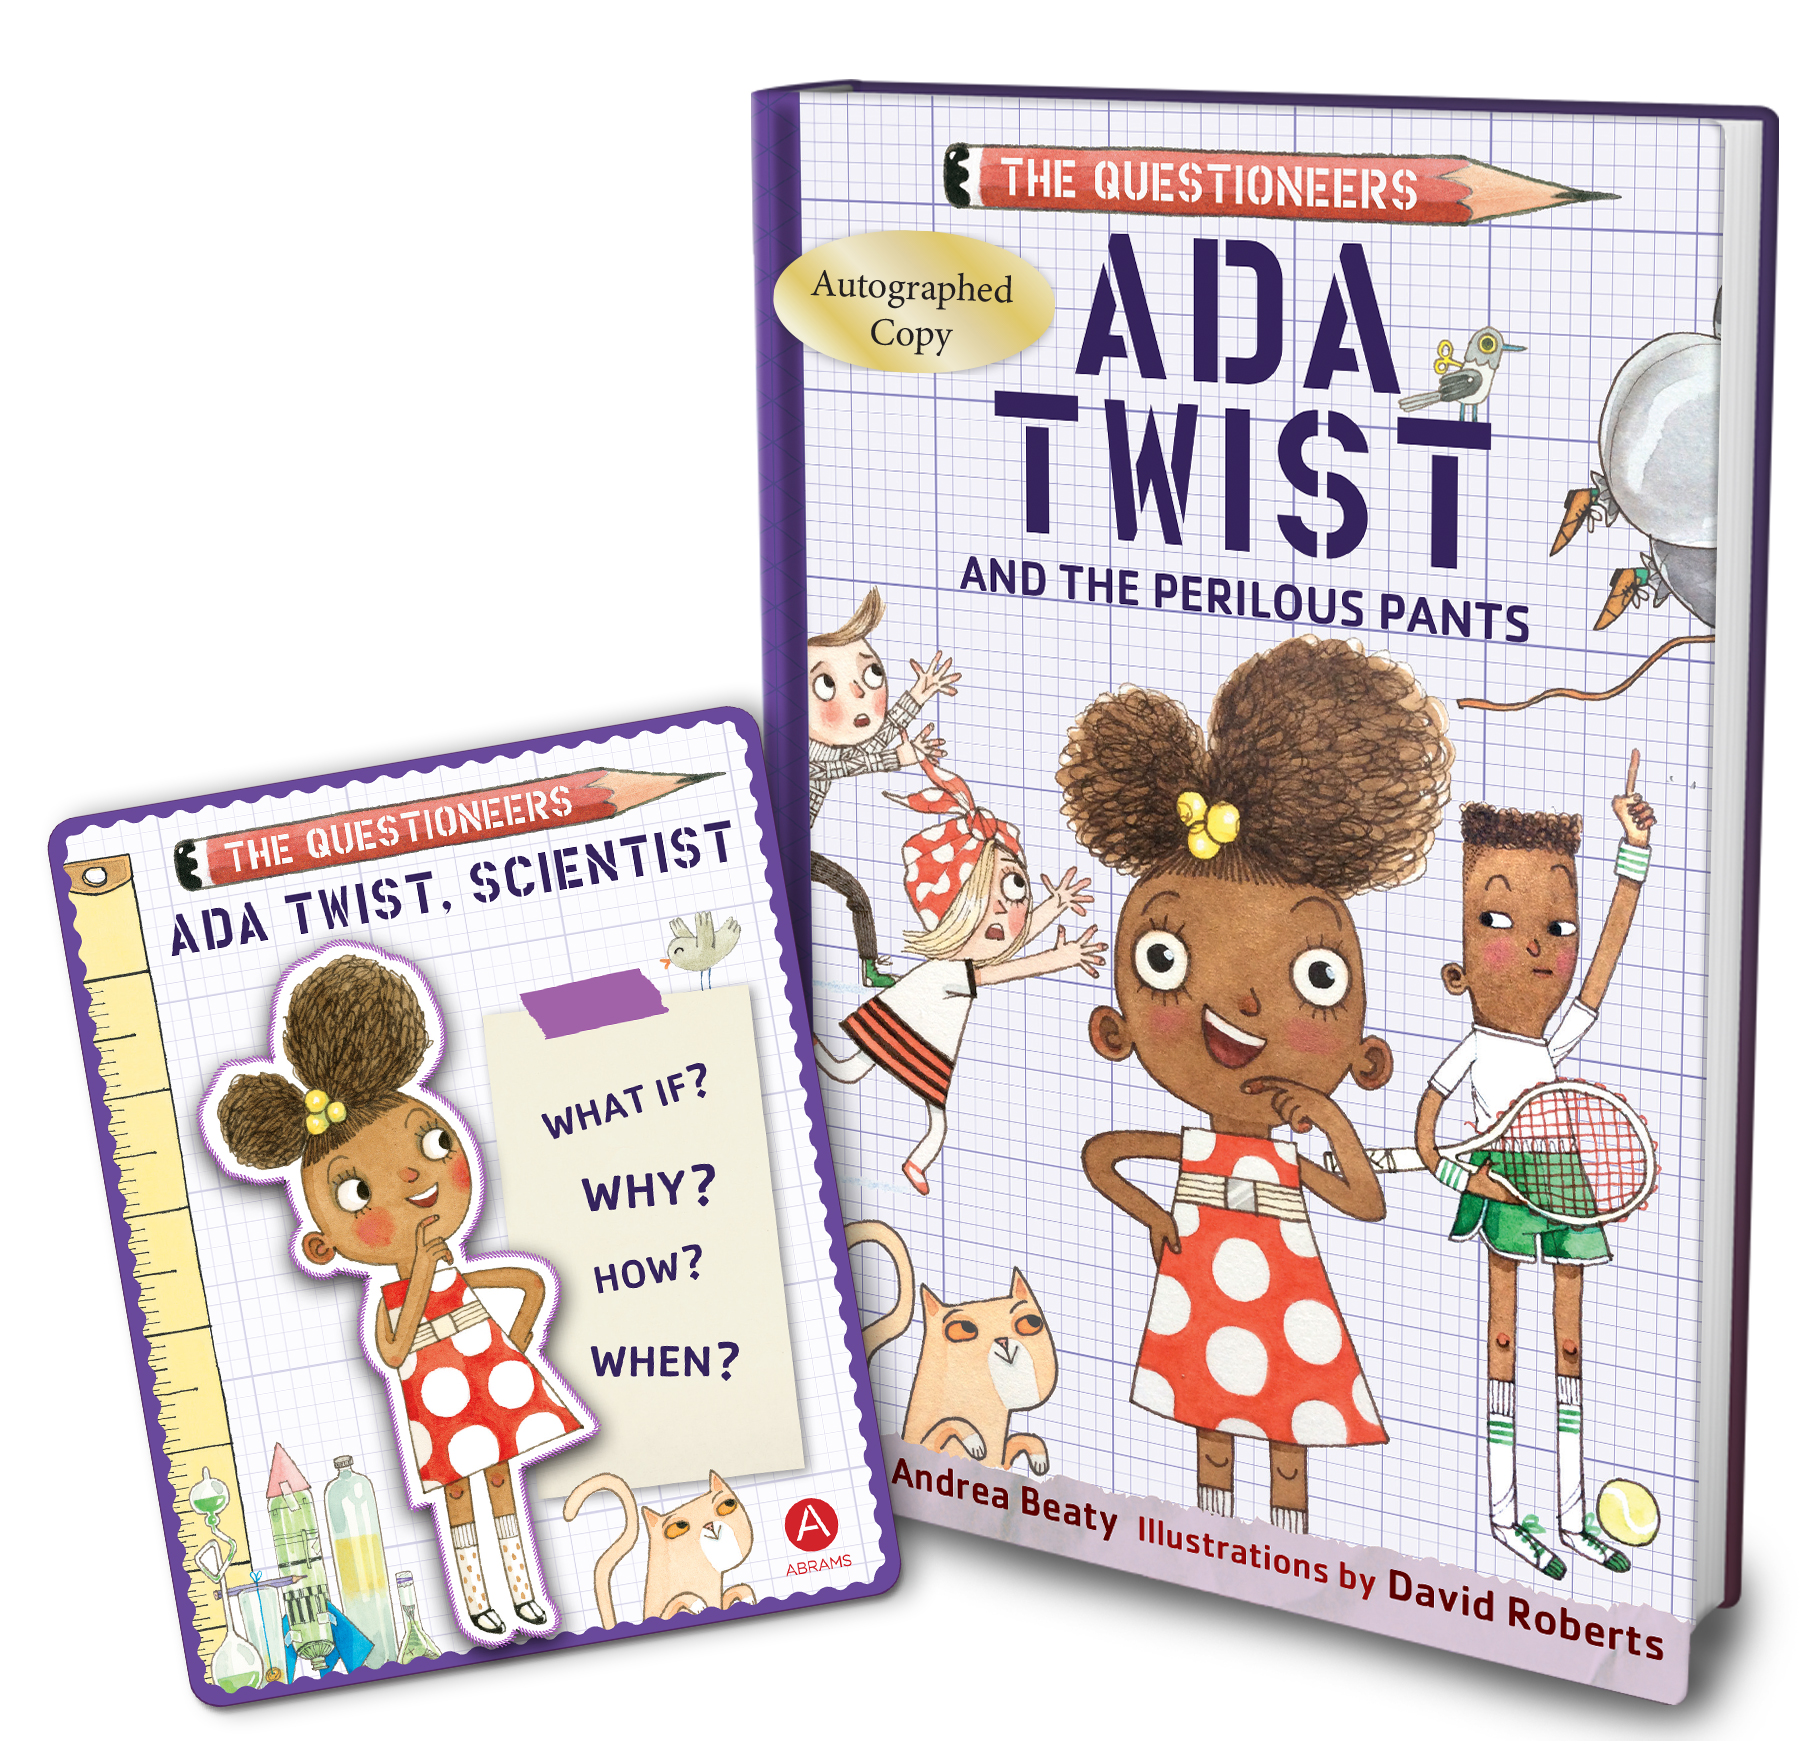 Ada Twist book and patch.jpg